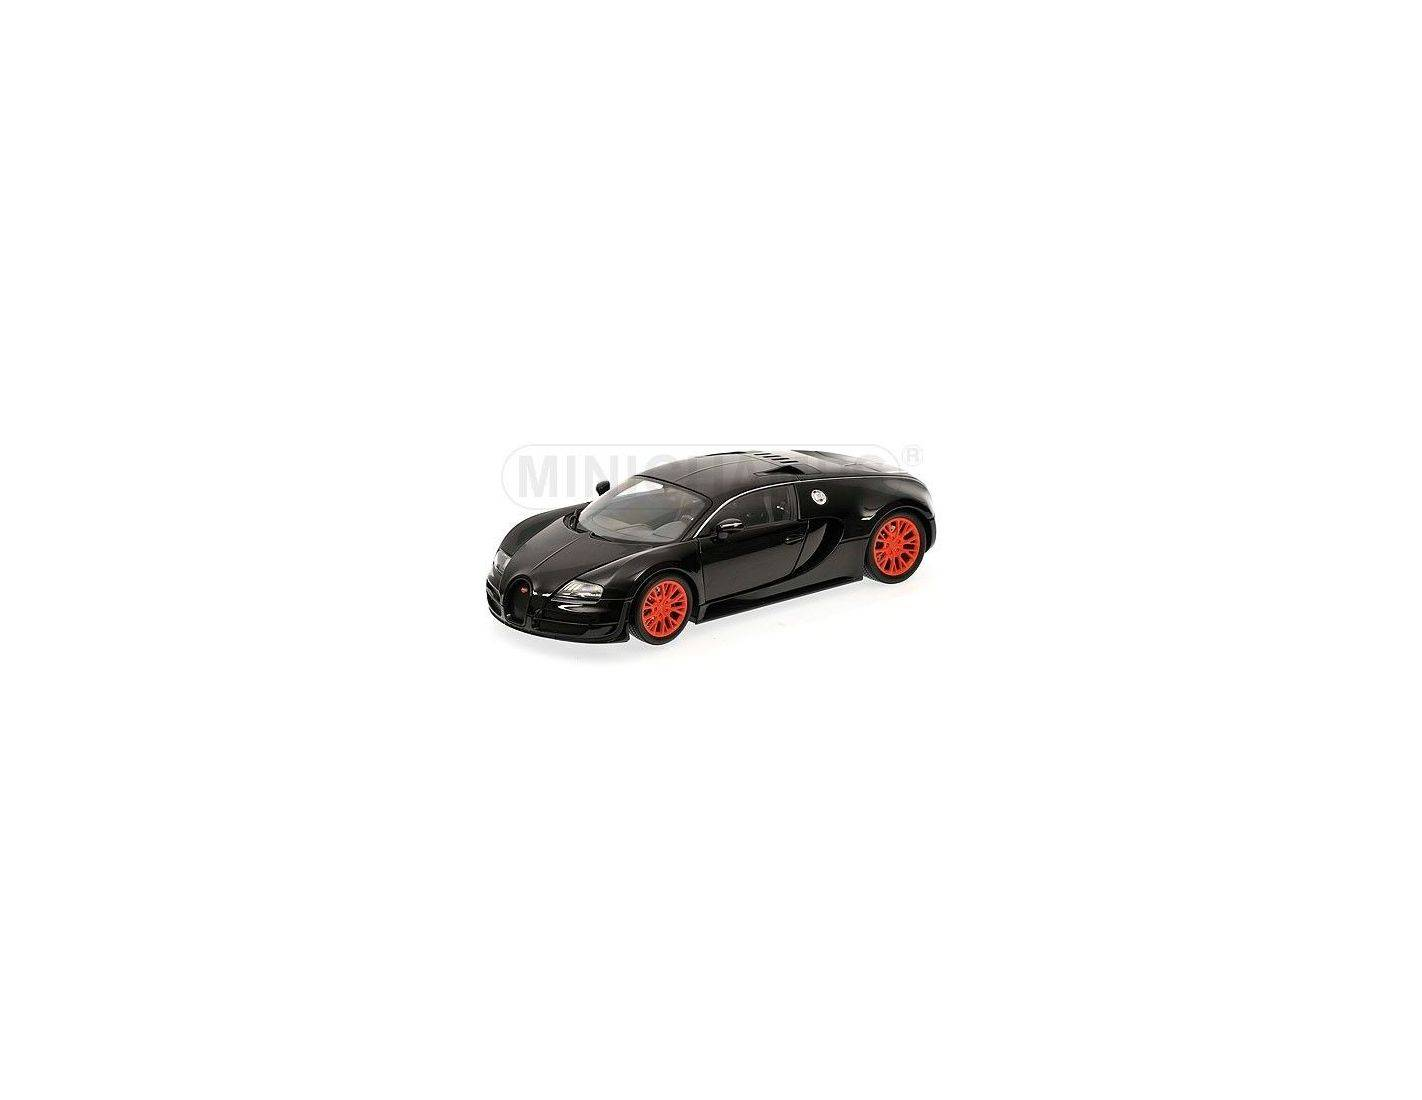 minichamps pm100110842 bugatti veyron super sport 2010. Black Bedroom Furniture Sets. Home Design Ideas